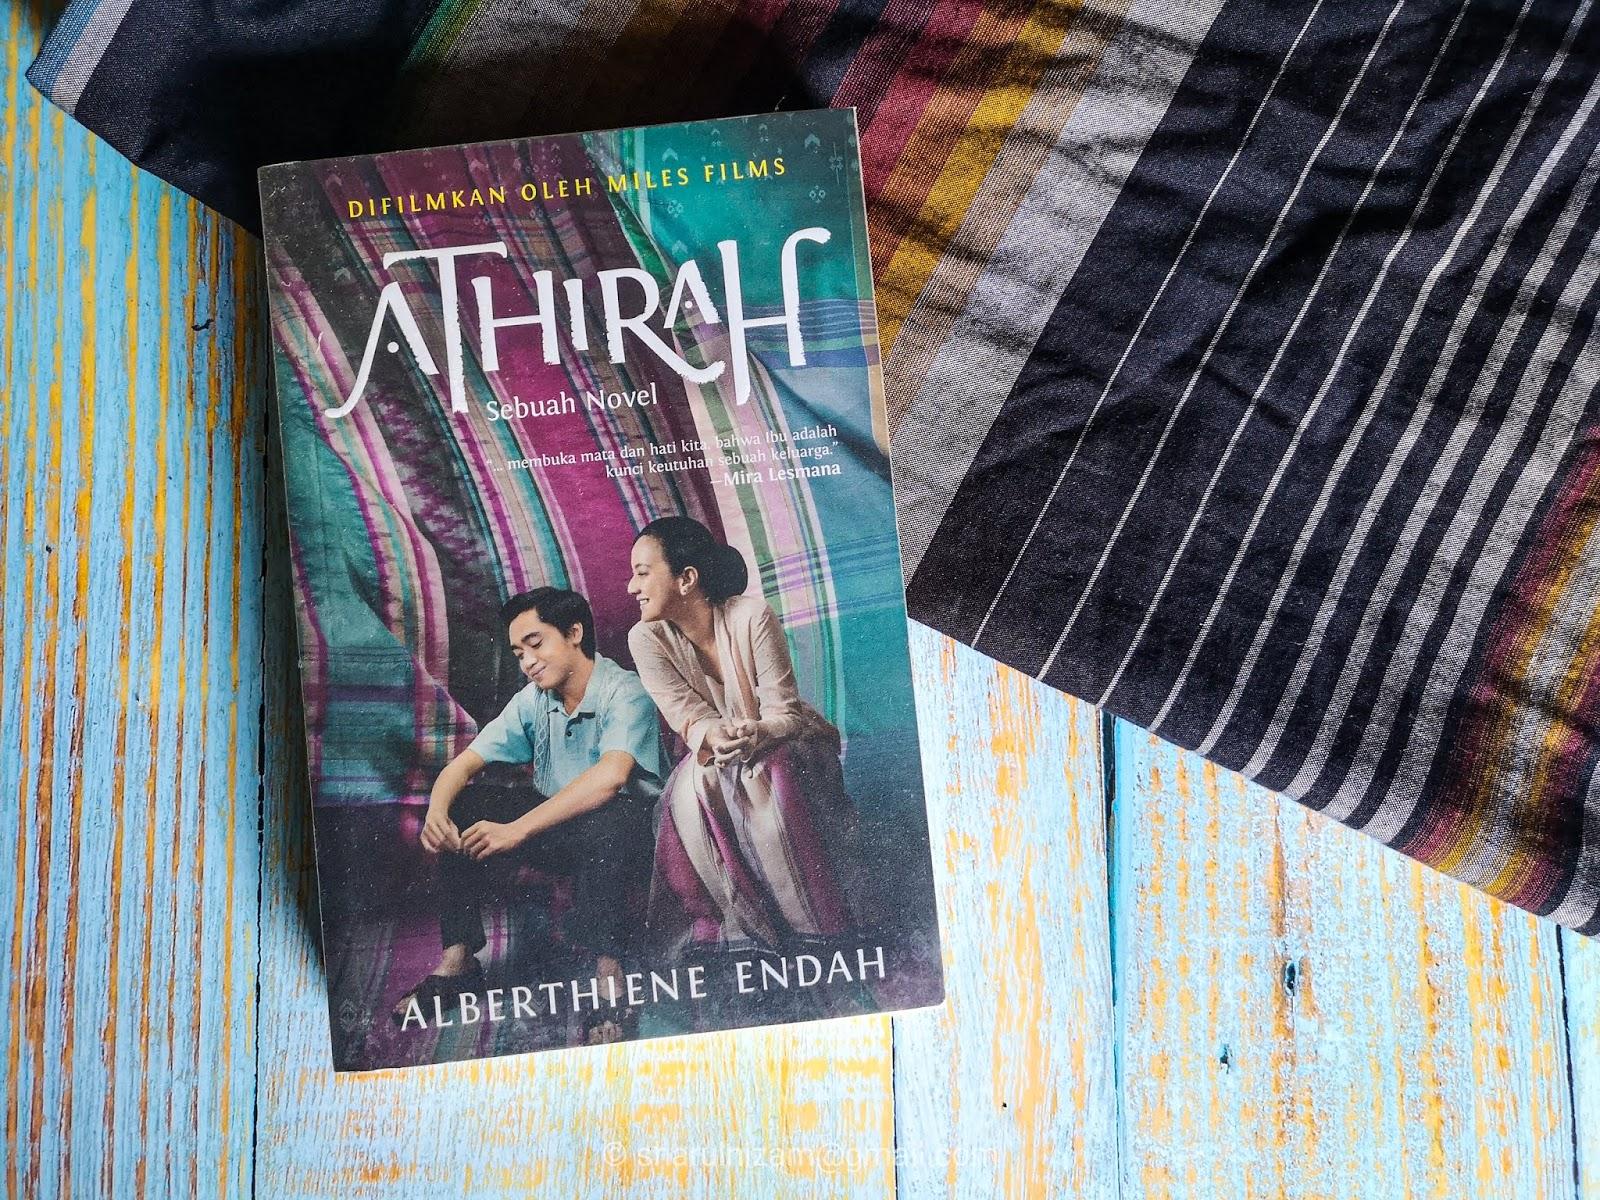 Athirah (Alberthiene Endah)